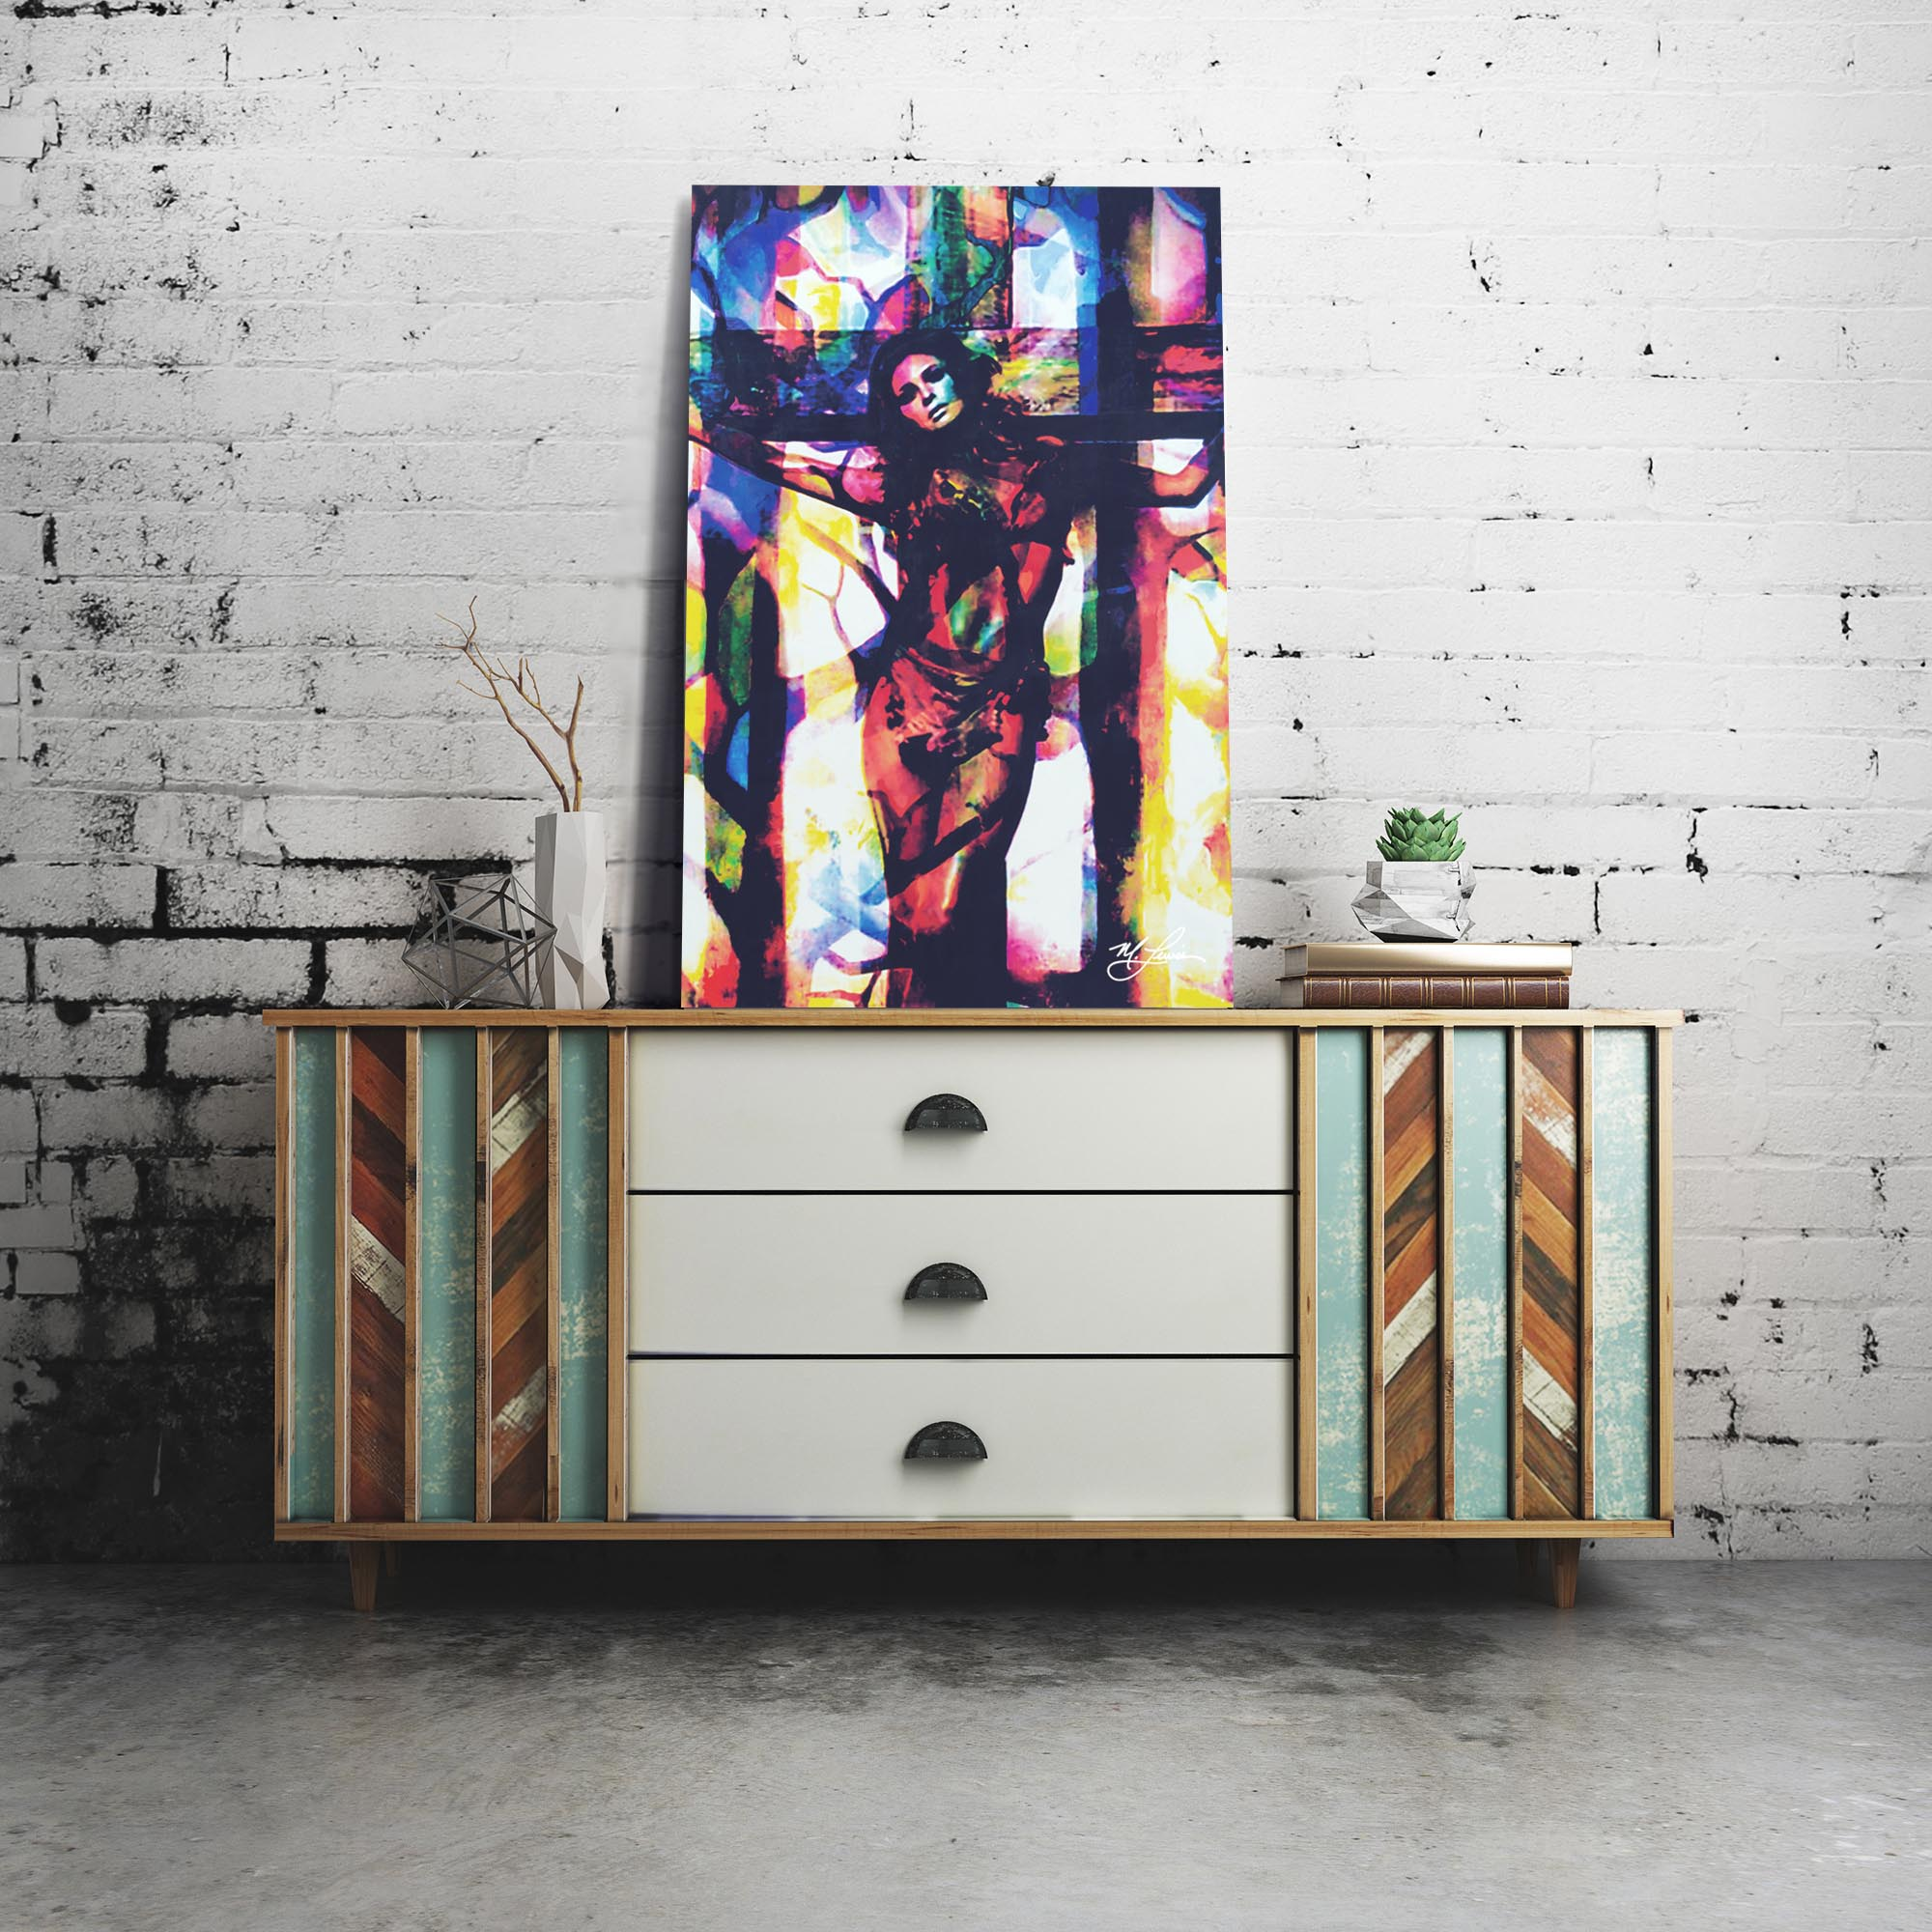 Raquel Welch Convicted Silk by Mark Lewis - Celebrity Pop Art on Metal or Plexiglass - ML0036